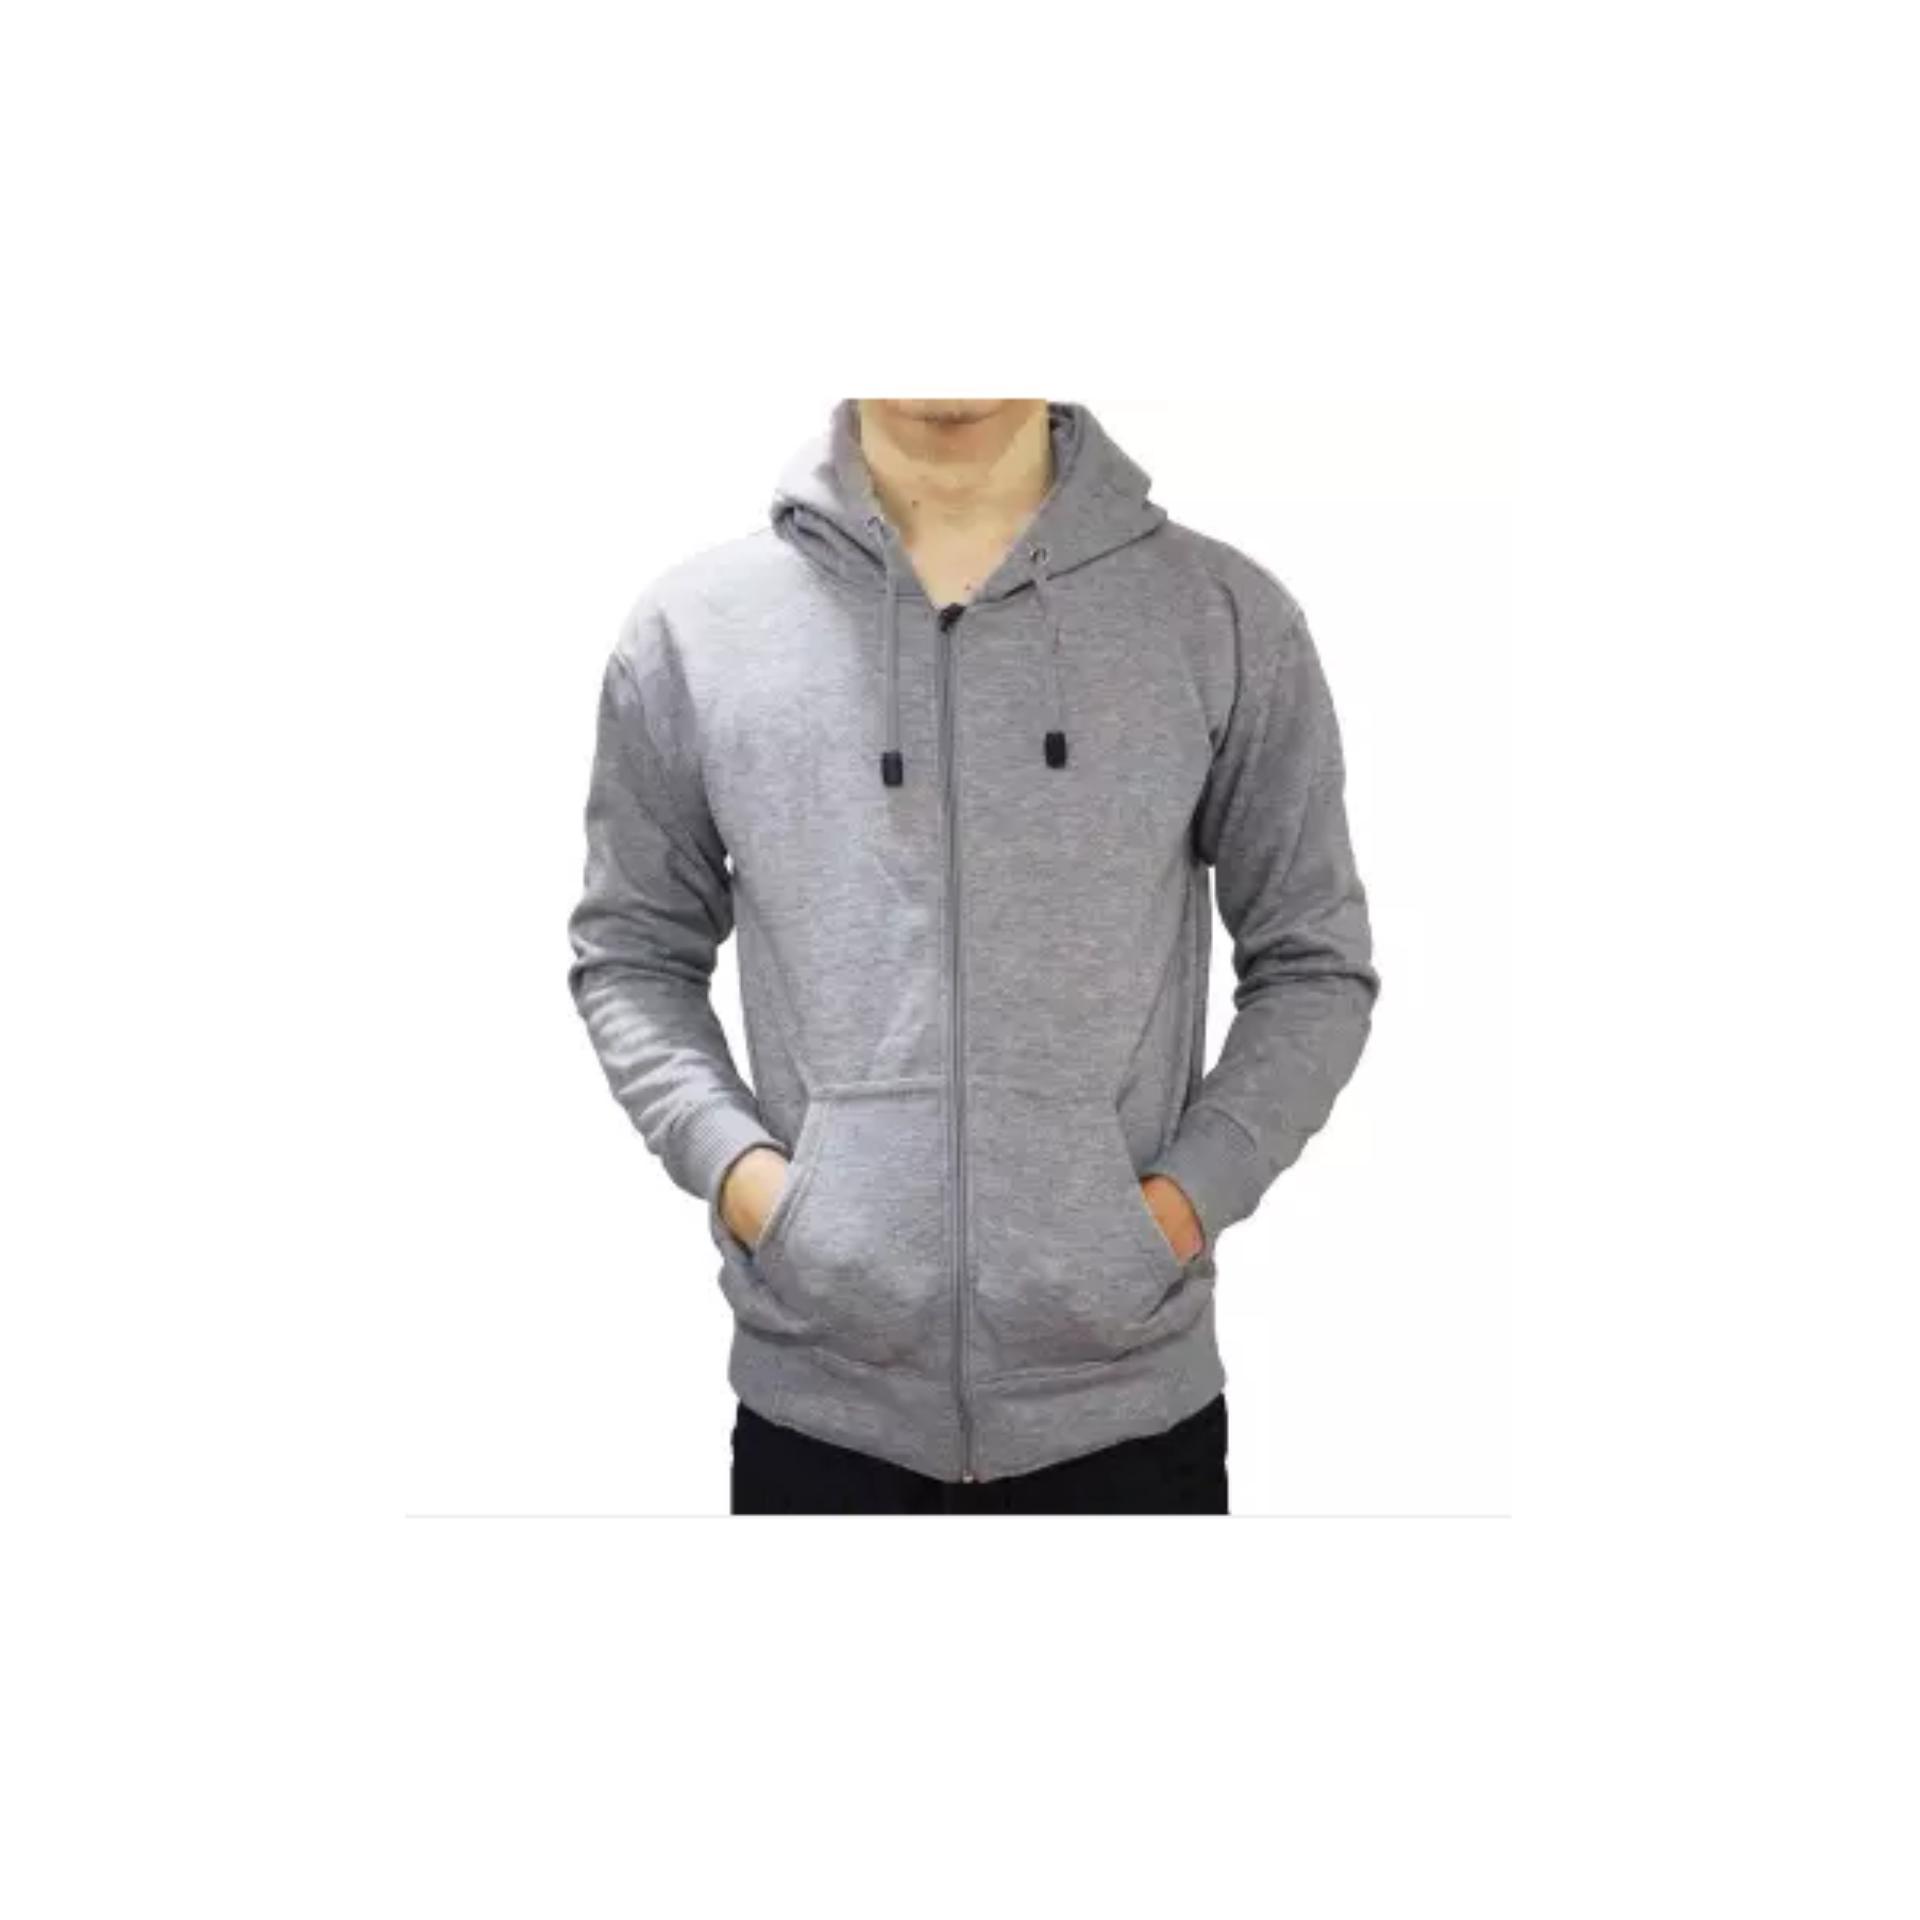 Harga Baru Jaket Sweater Polos Hoodie Zipper Abu Misty Bandingkan Simpan Hodie